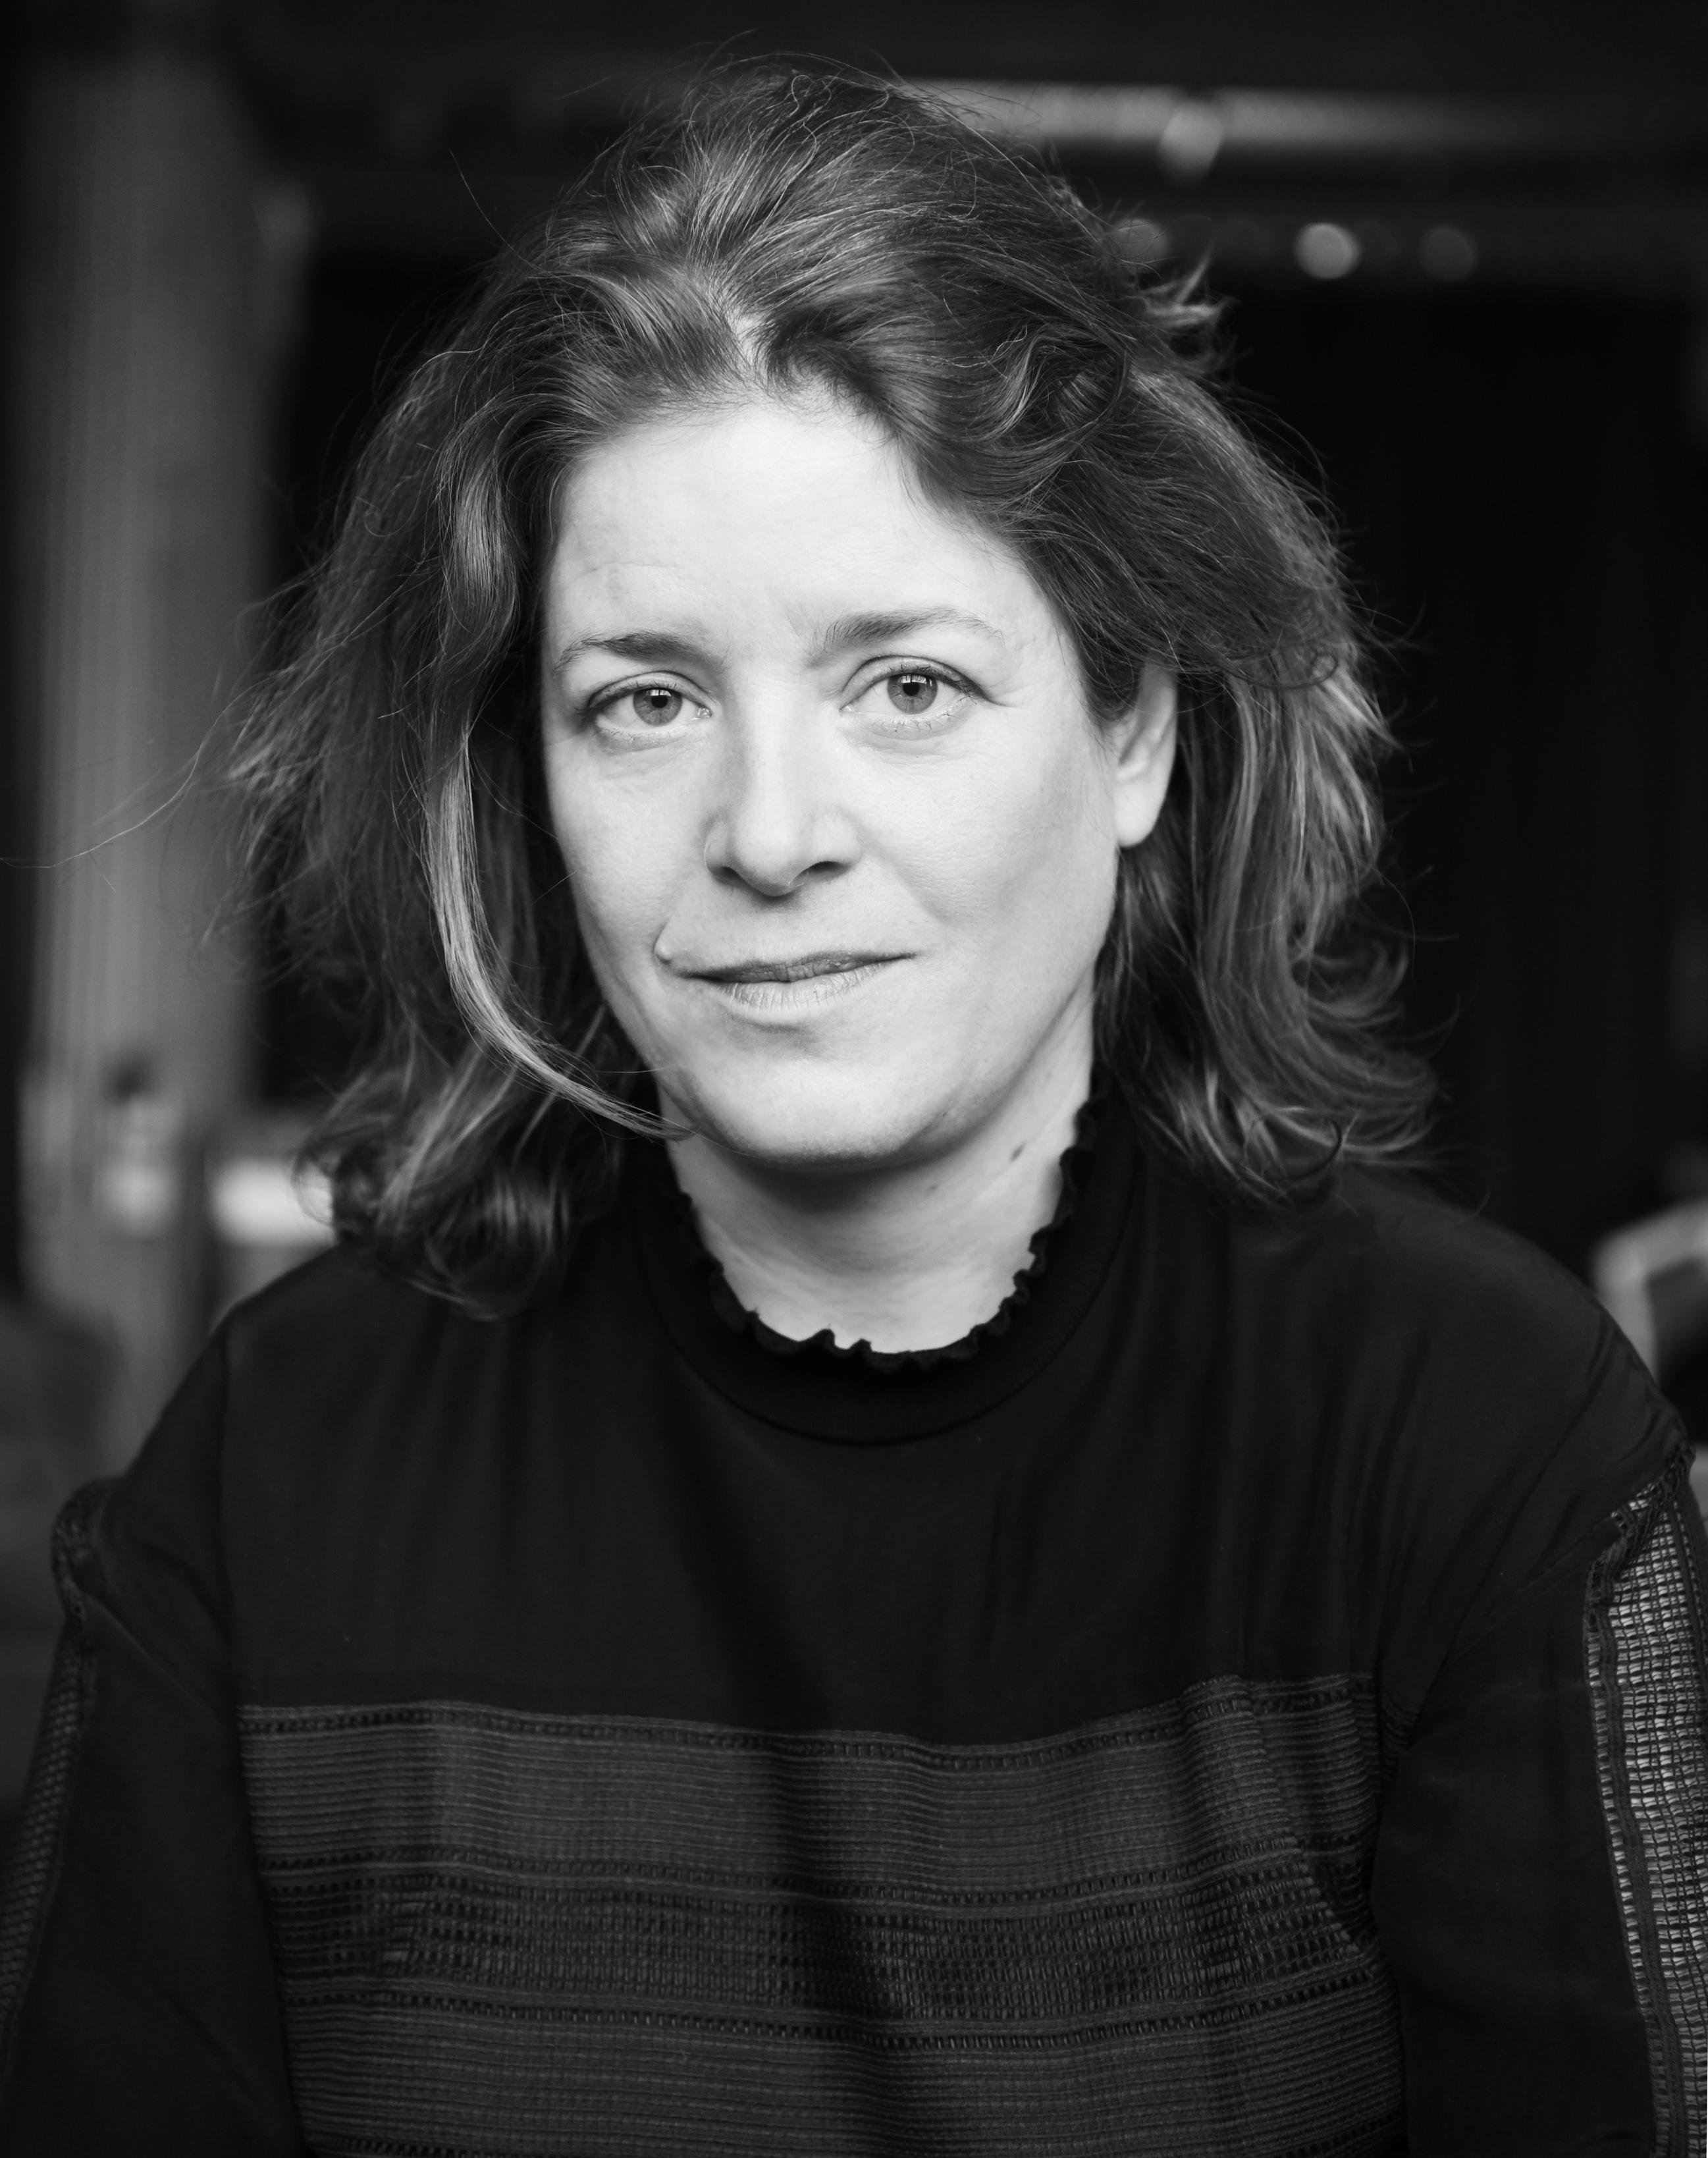 Foto EK Maria Ziegelböck